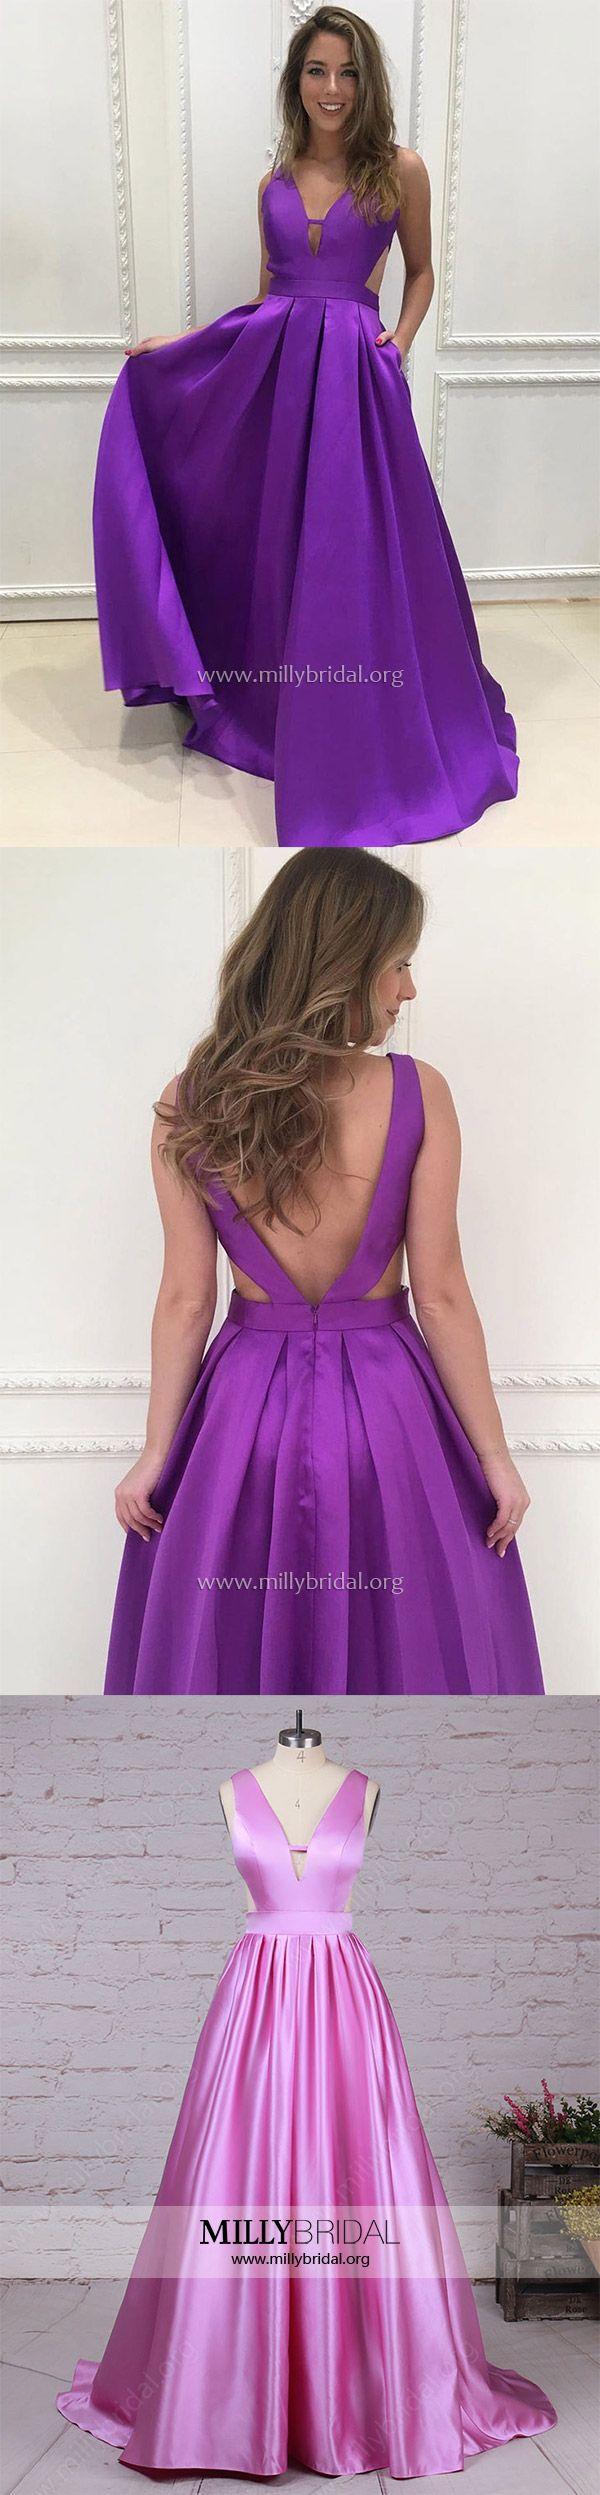 Vestidos de baile largos, vestidos de baile princesa para ...